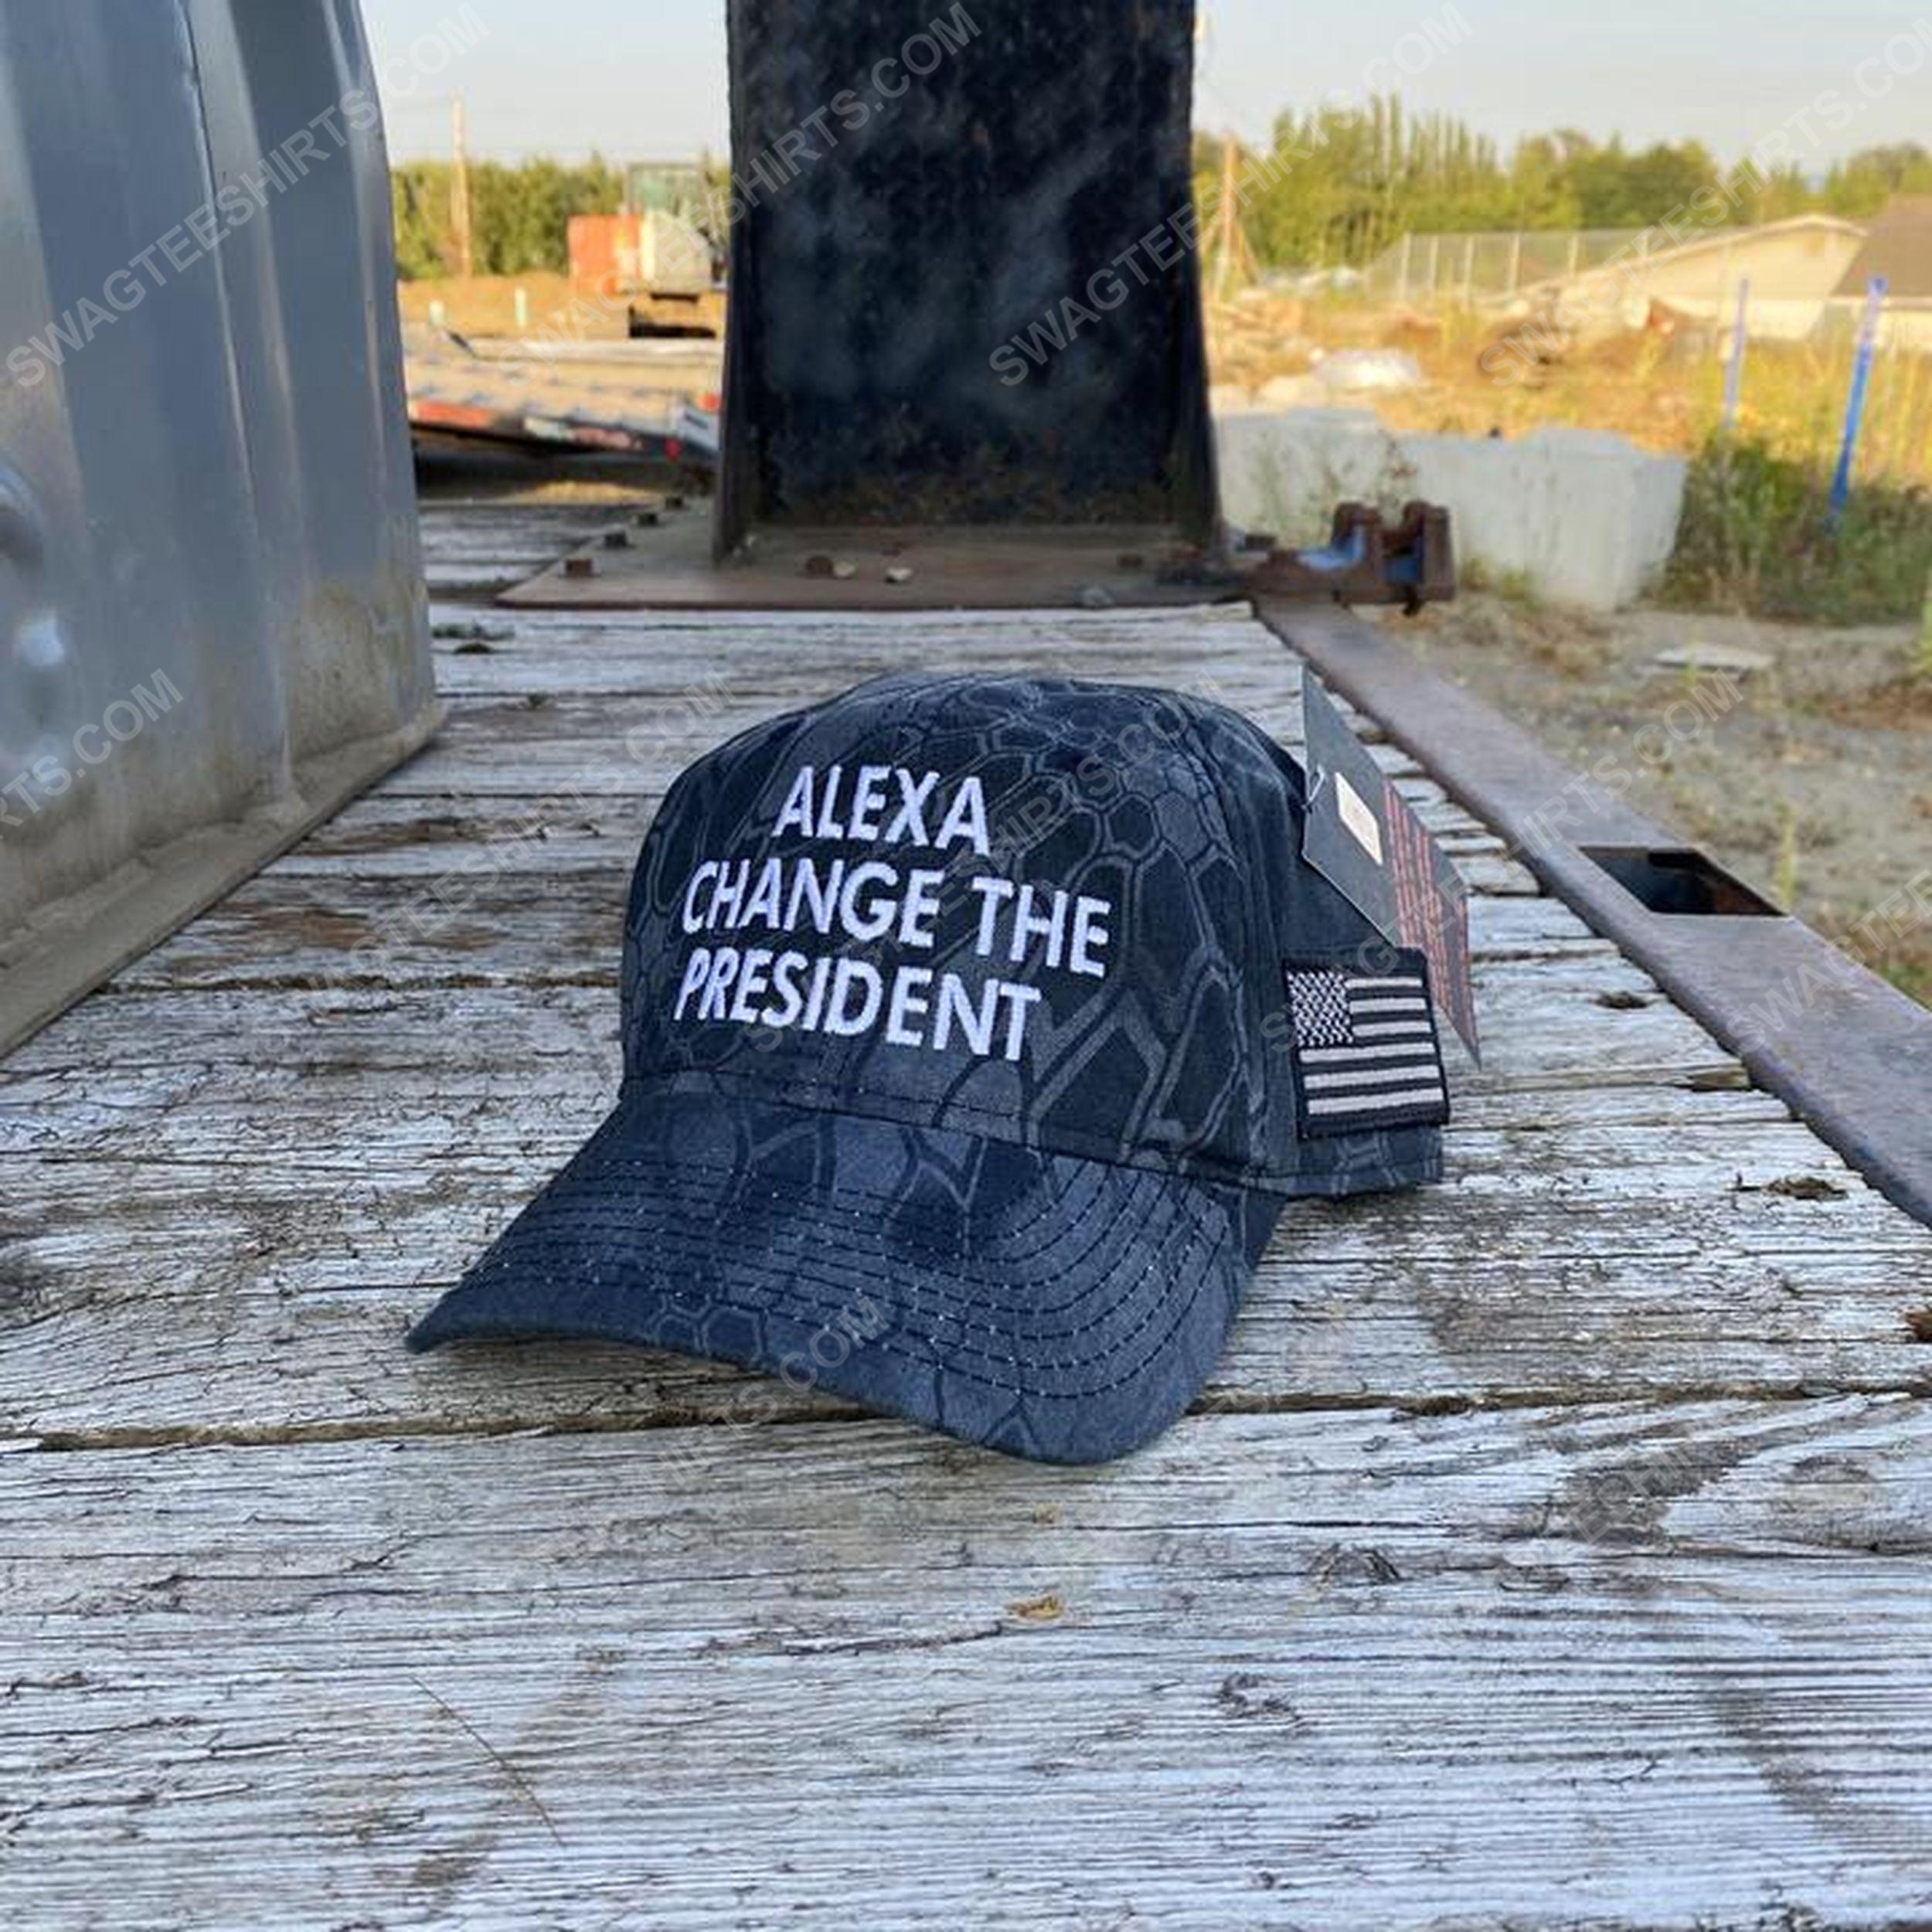 Alexa change the president full print classic hat 1 - Copy (3)